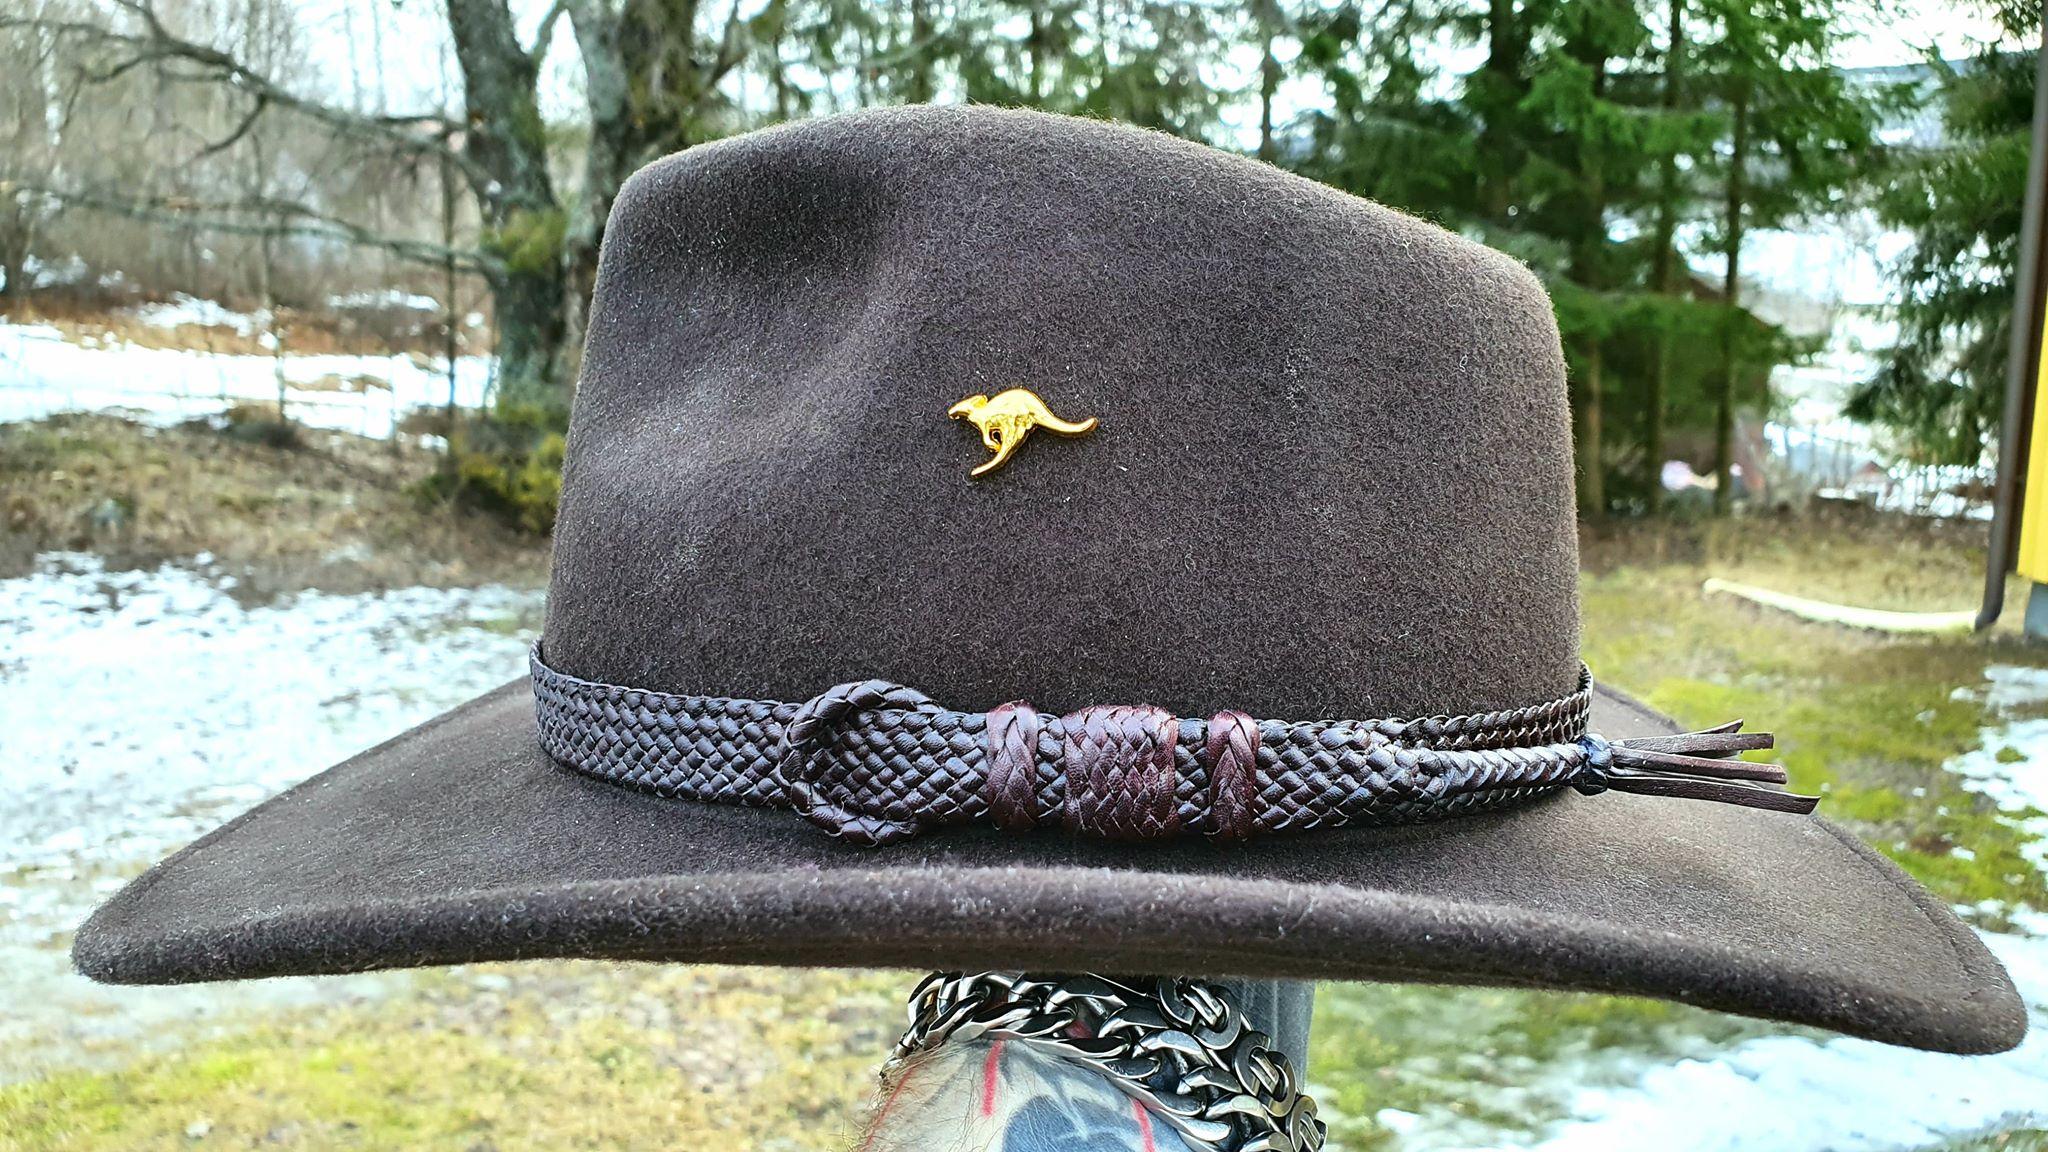 Leather hatband braided